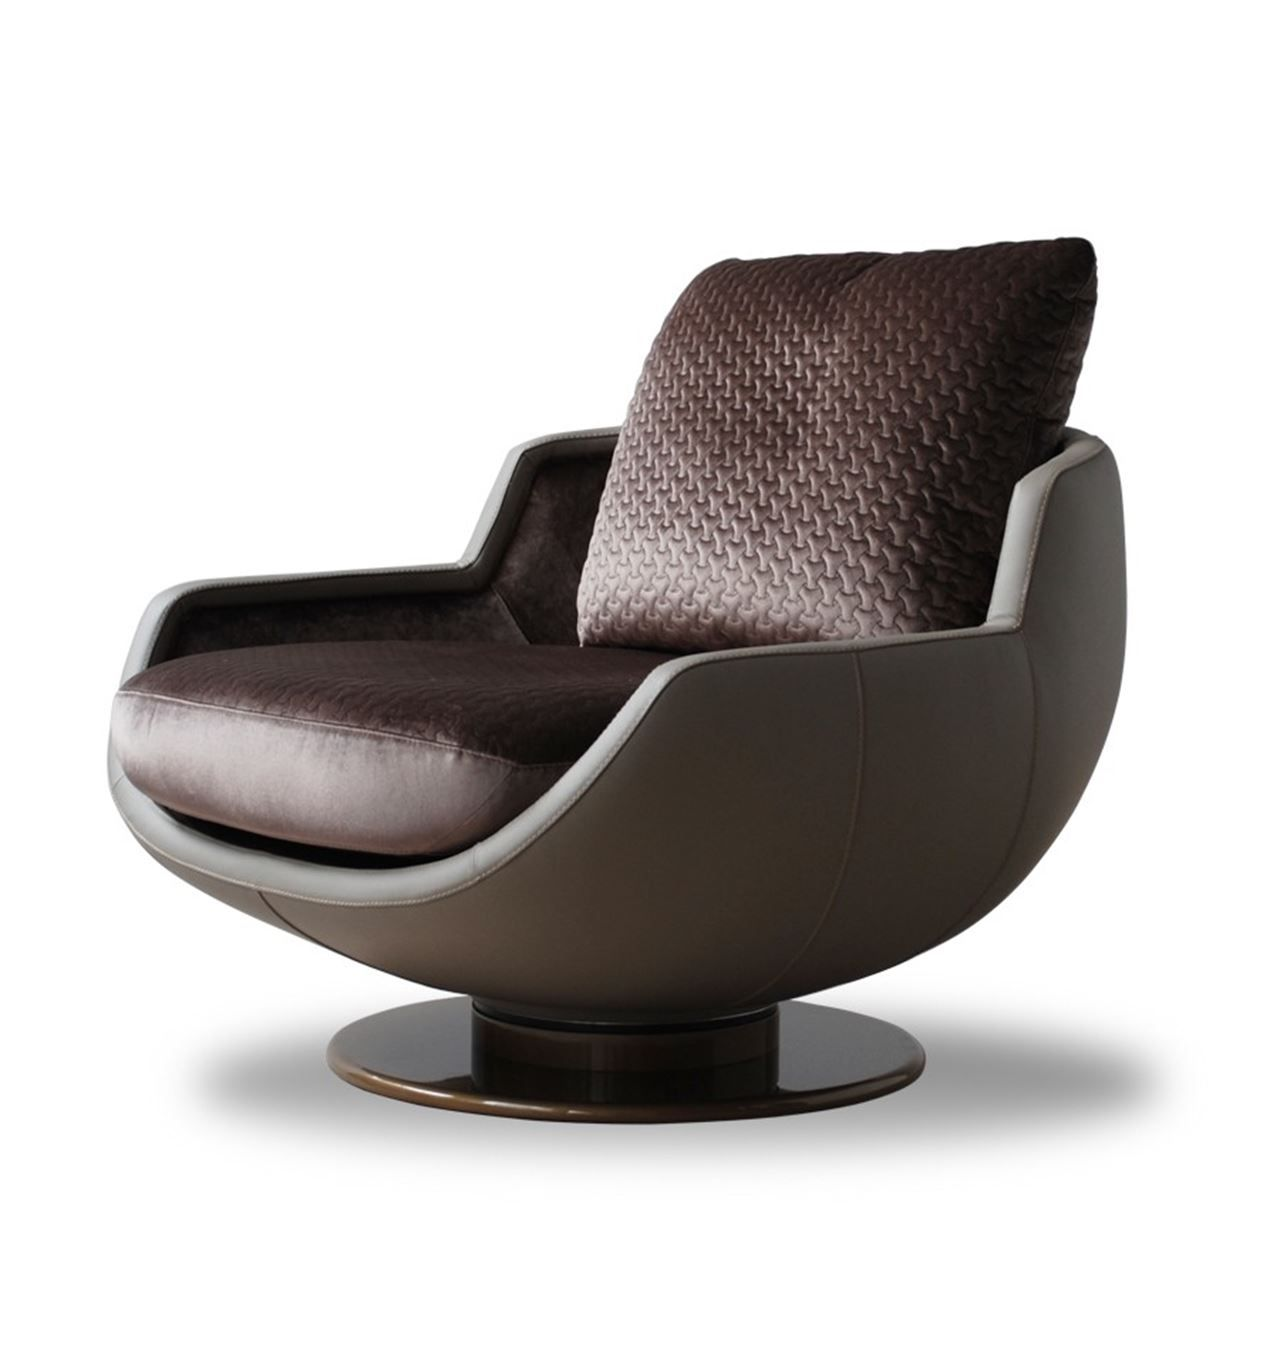 3d Home Designbest: FORTUNE II - 1744 Swivel Chair